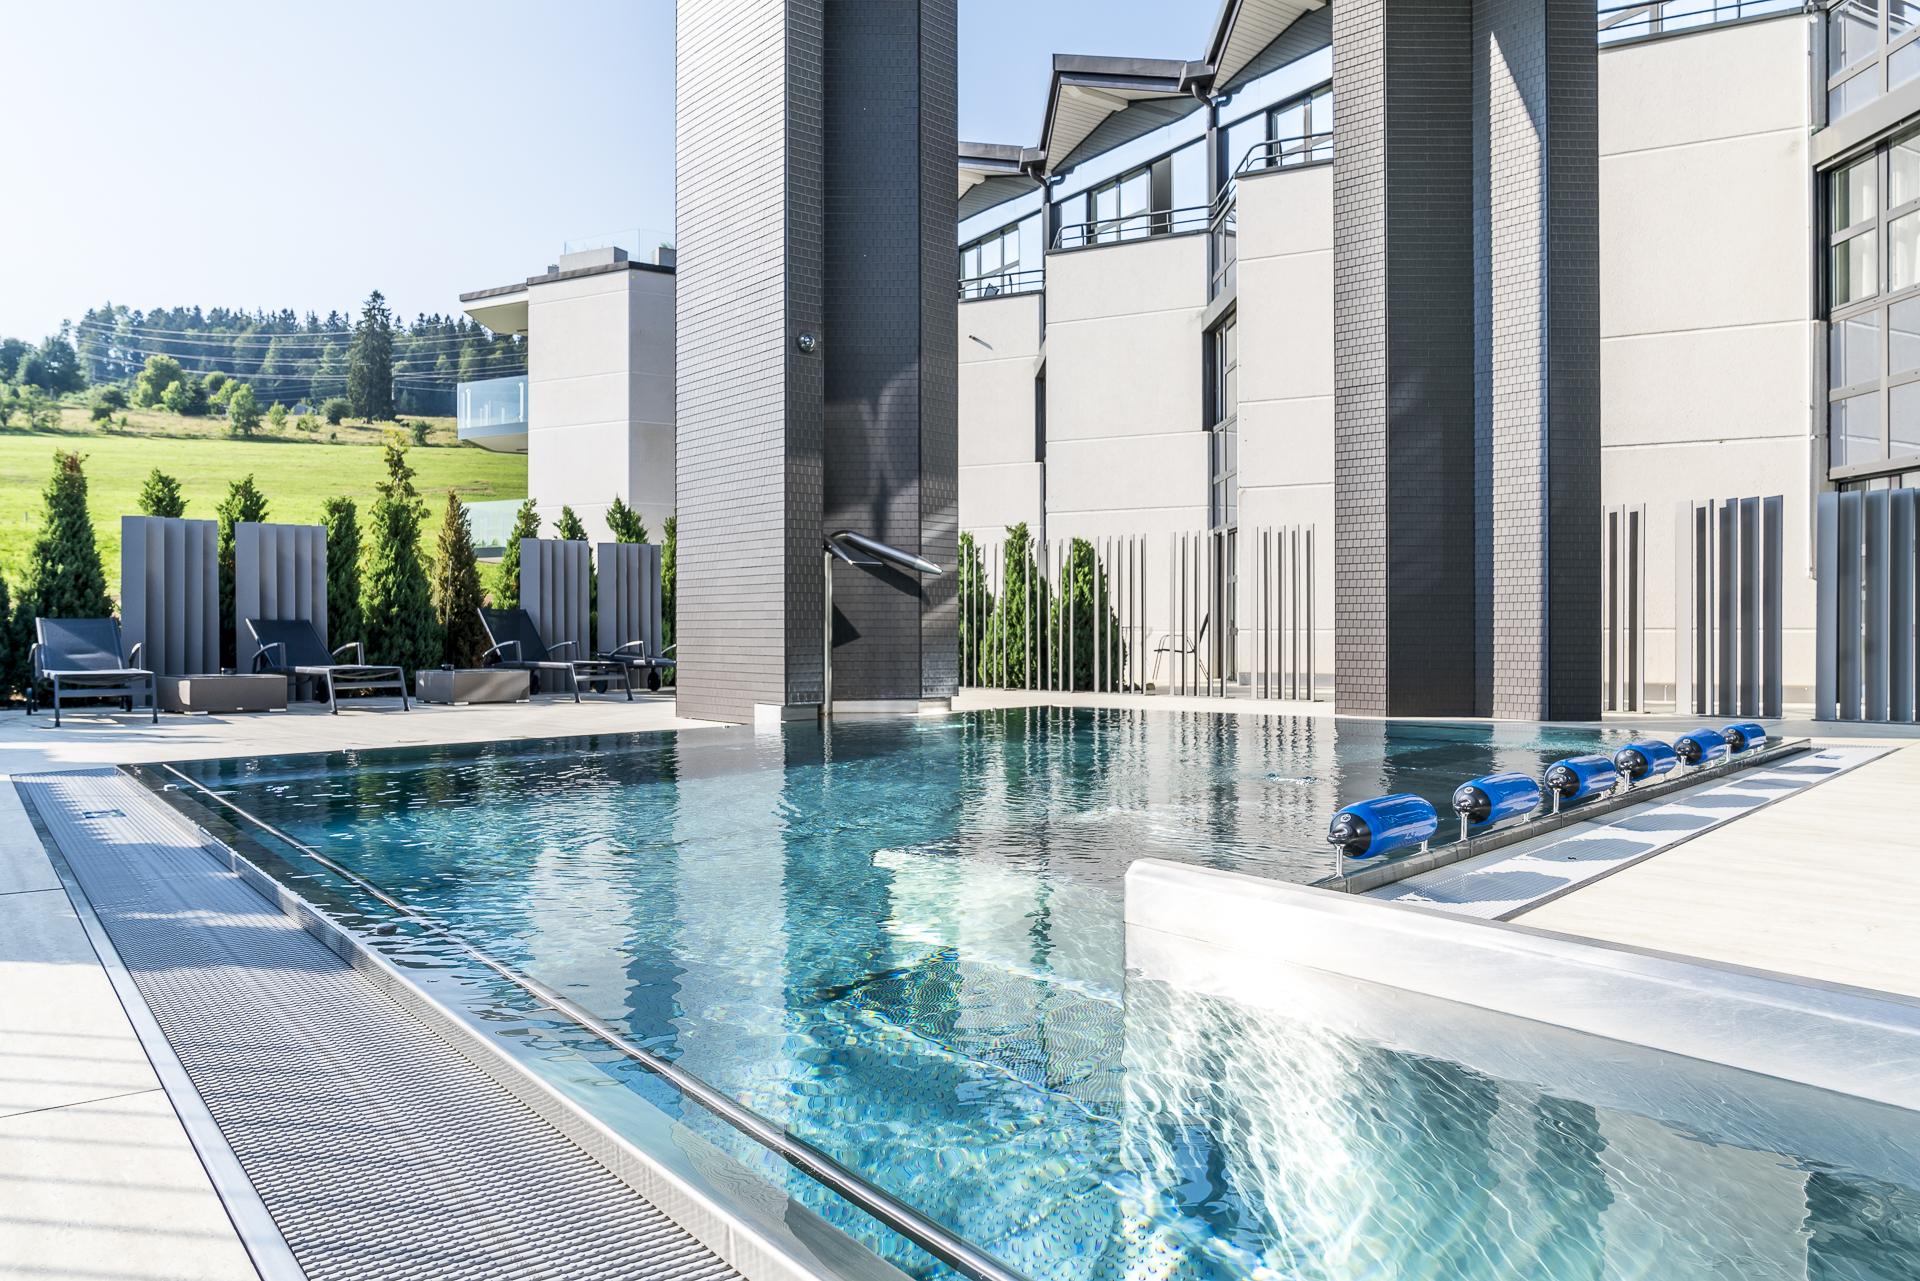 Grandhotel Les Endroits Pool